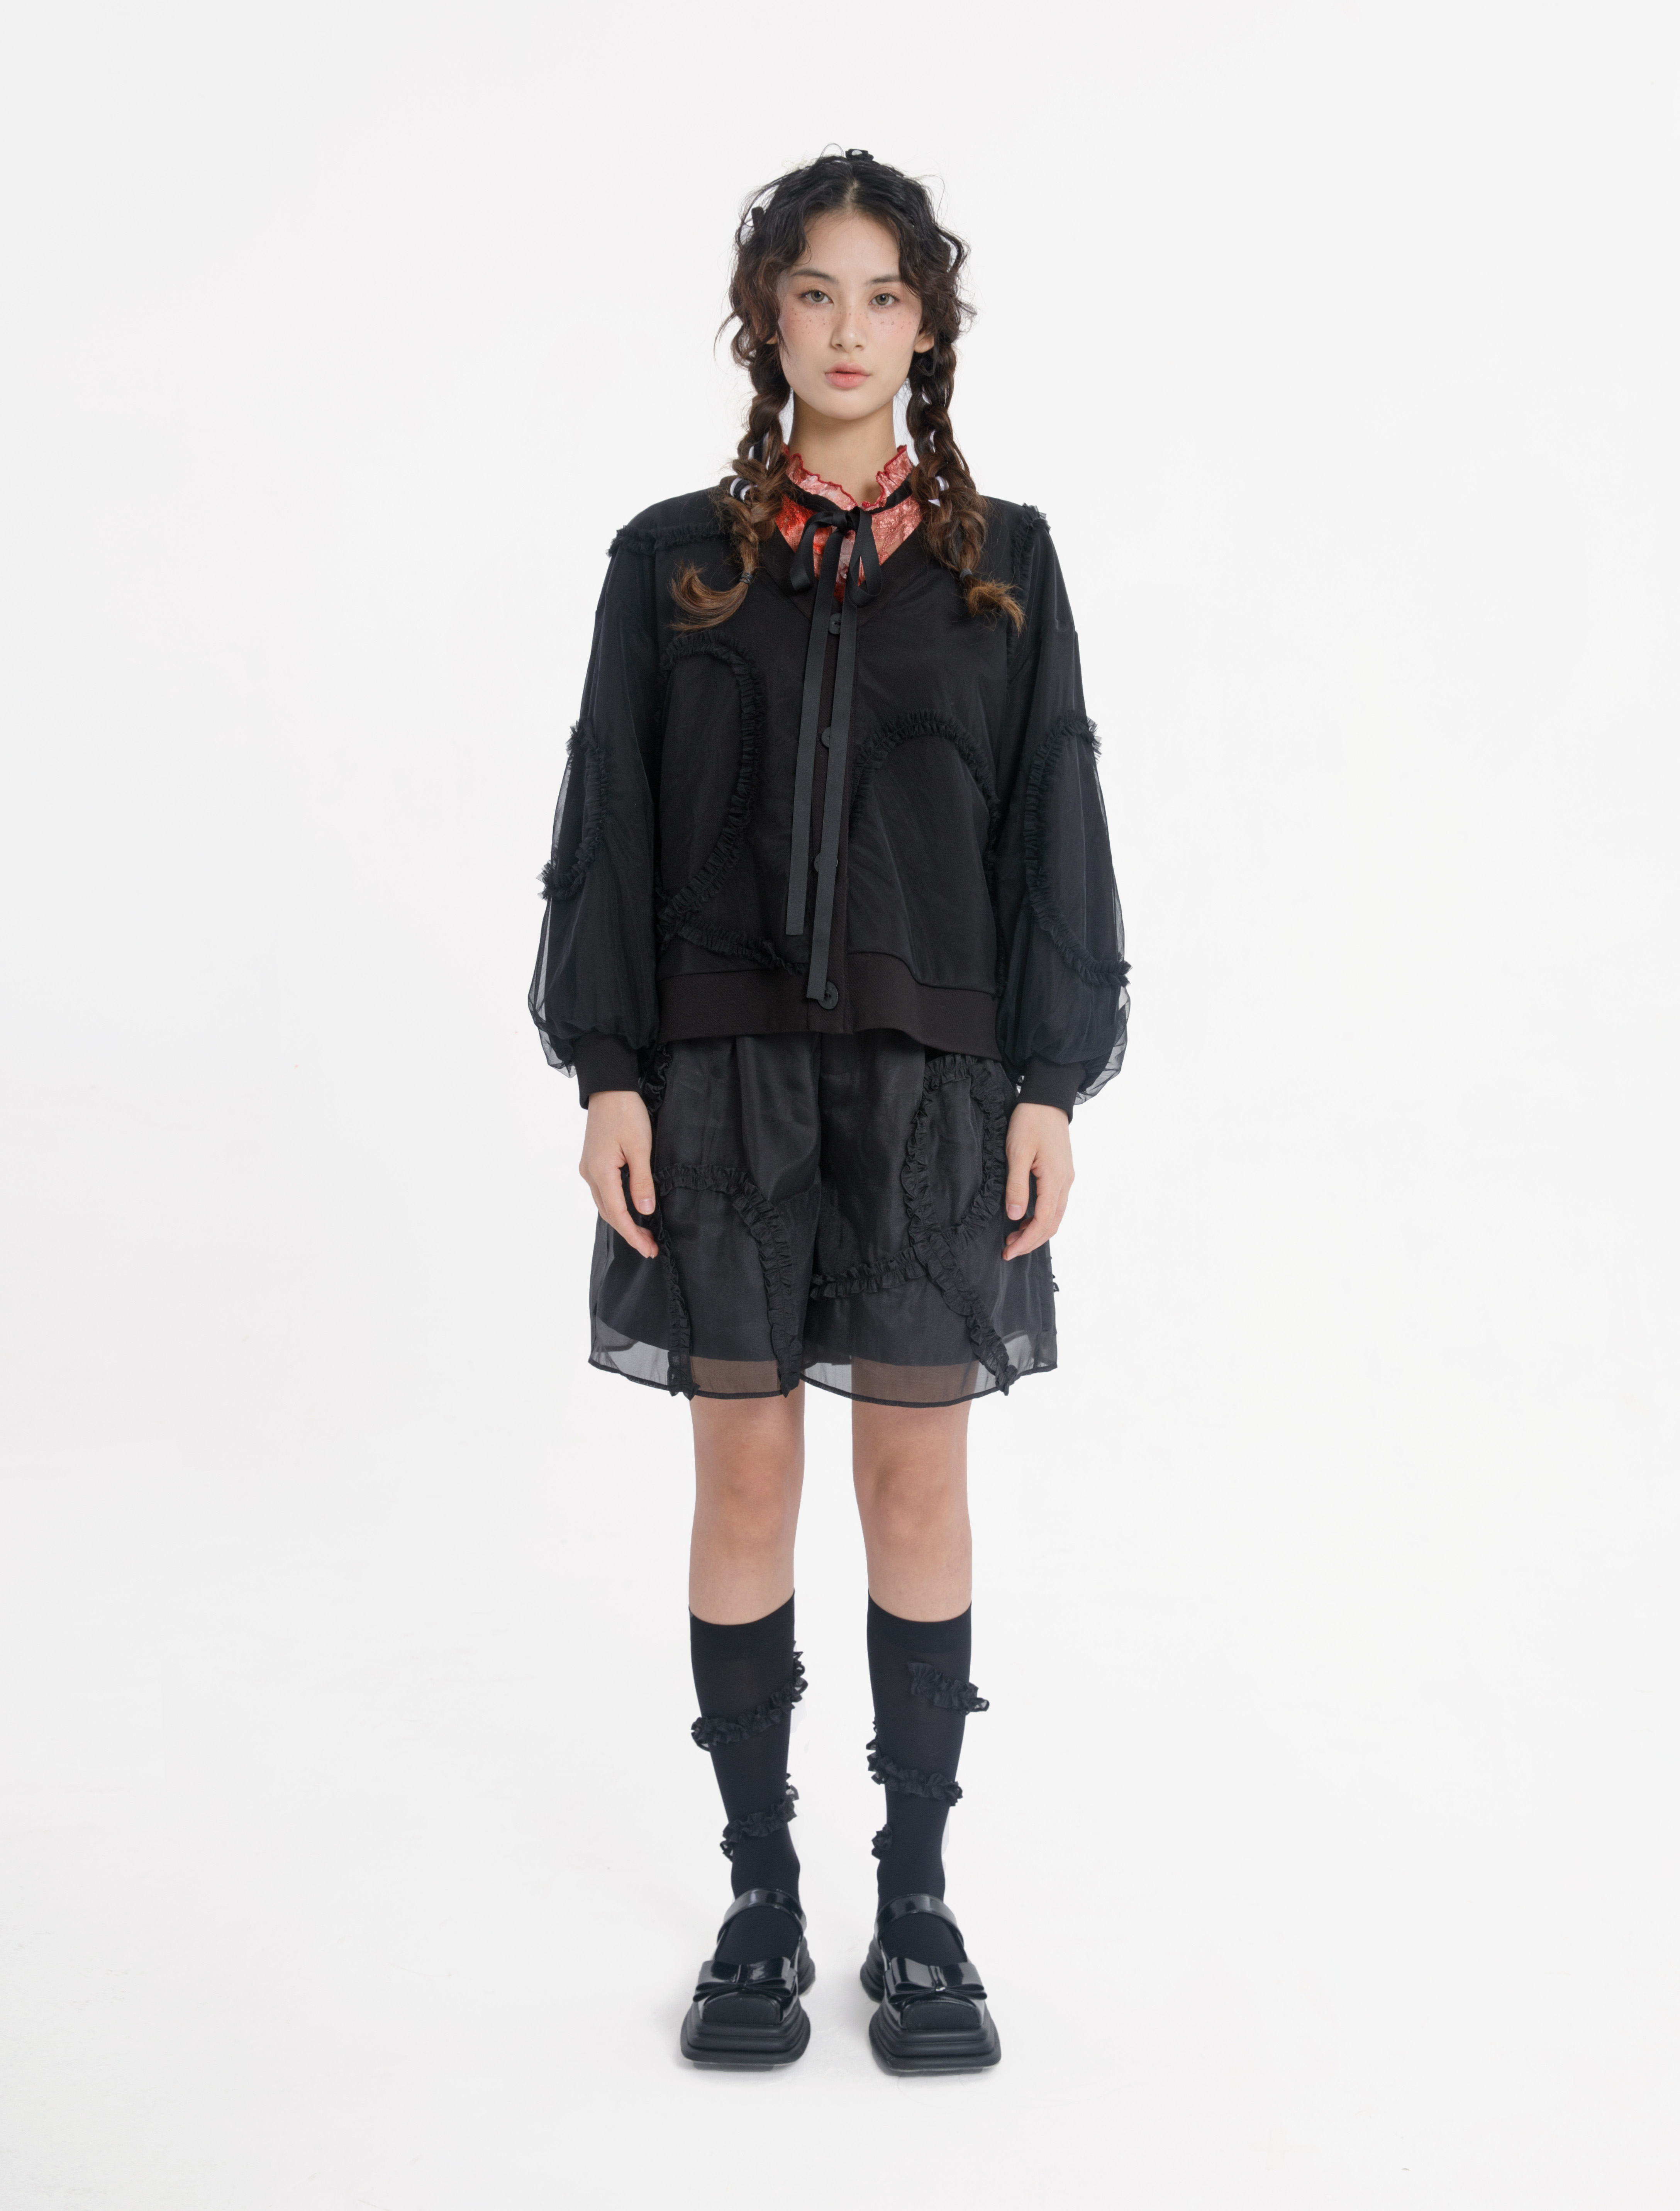 duetty2021秋季新款法式荷叶边设计感双层罩纱拼接外套夹克